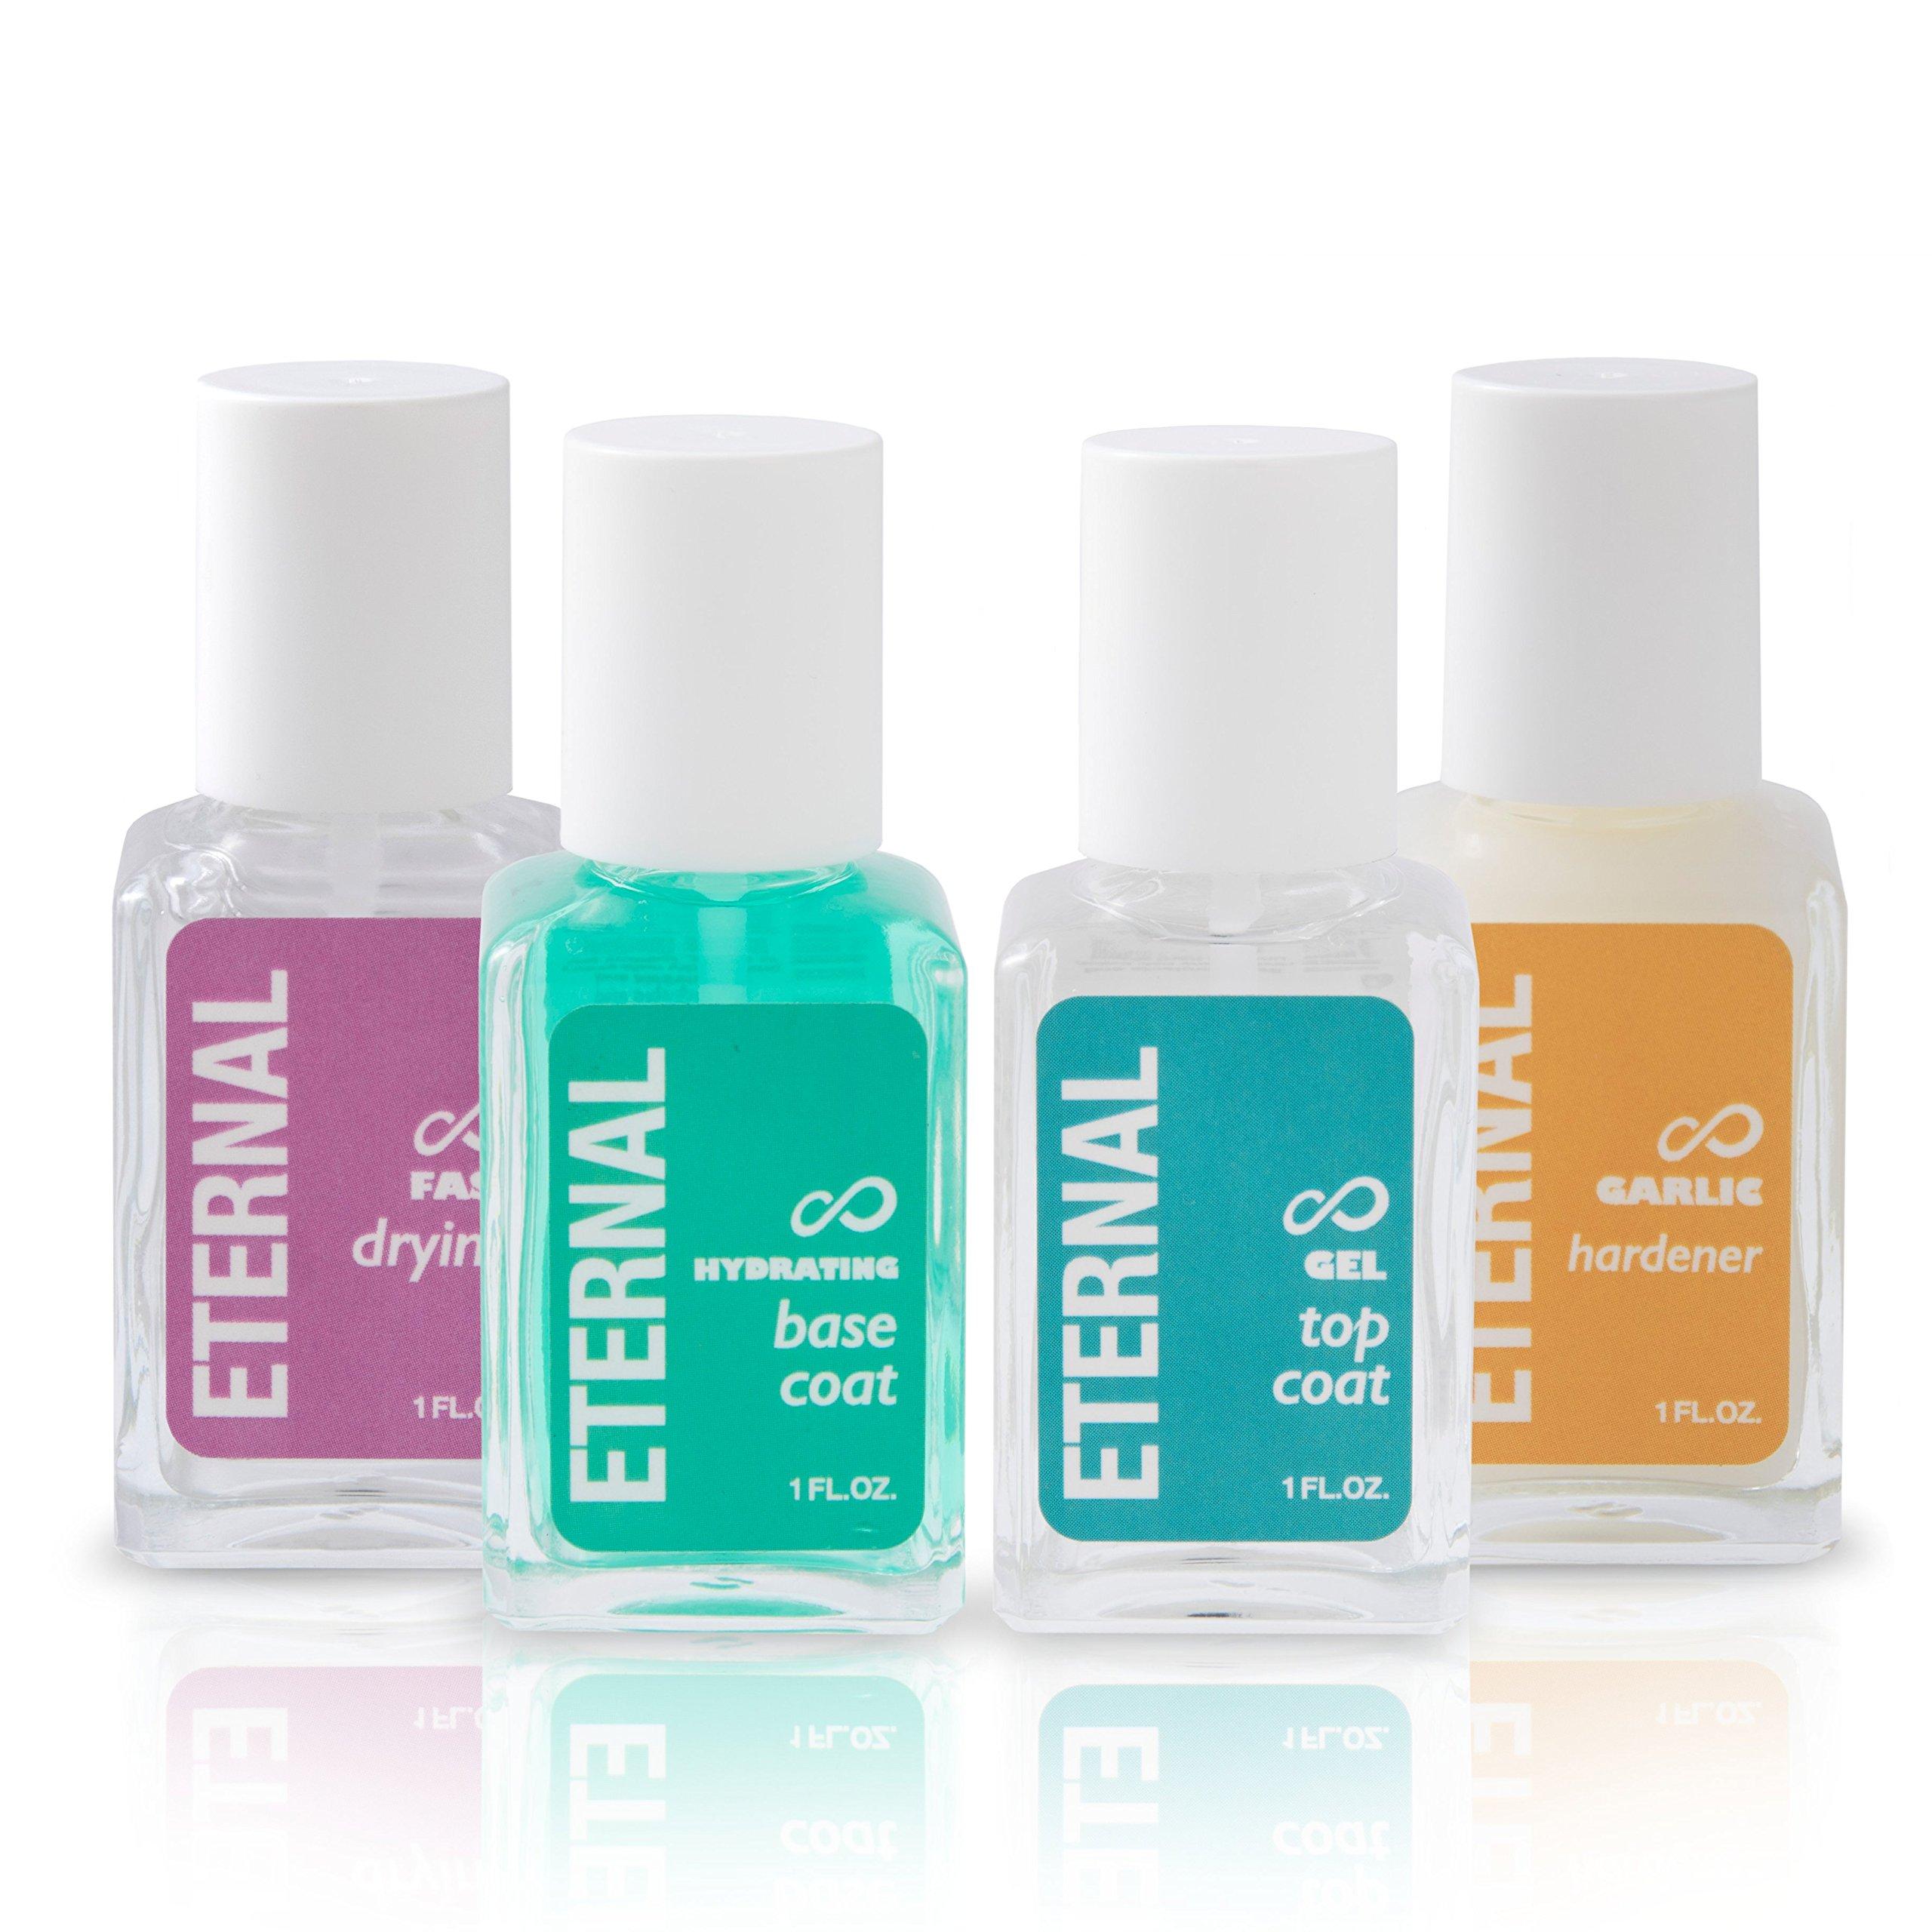 Eternal Enamel - Perfect Nails Set: Hardener, Gel Top Coat, Hydrating Base Coat & Fast Drying Polish (4 Pack - 1 FL.OZ.)